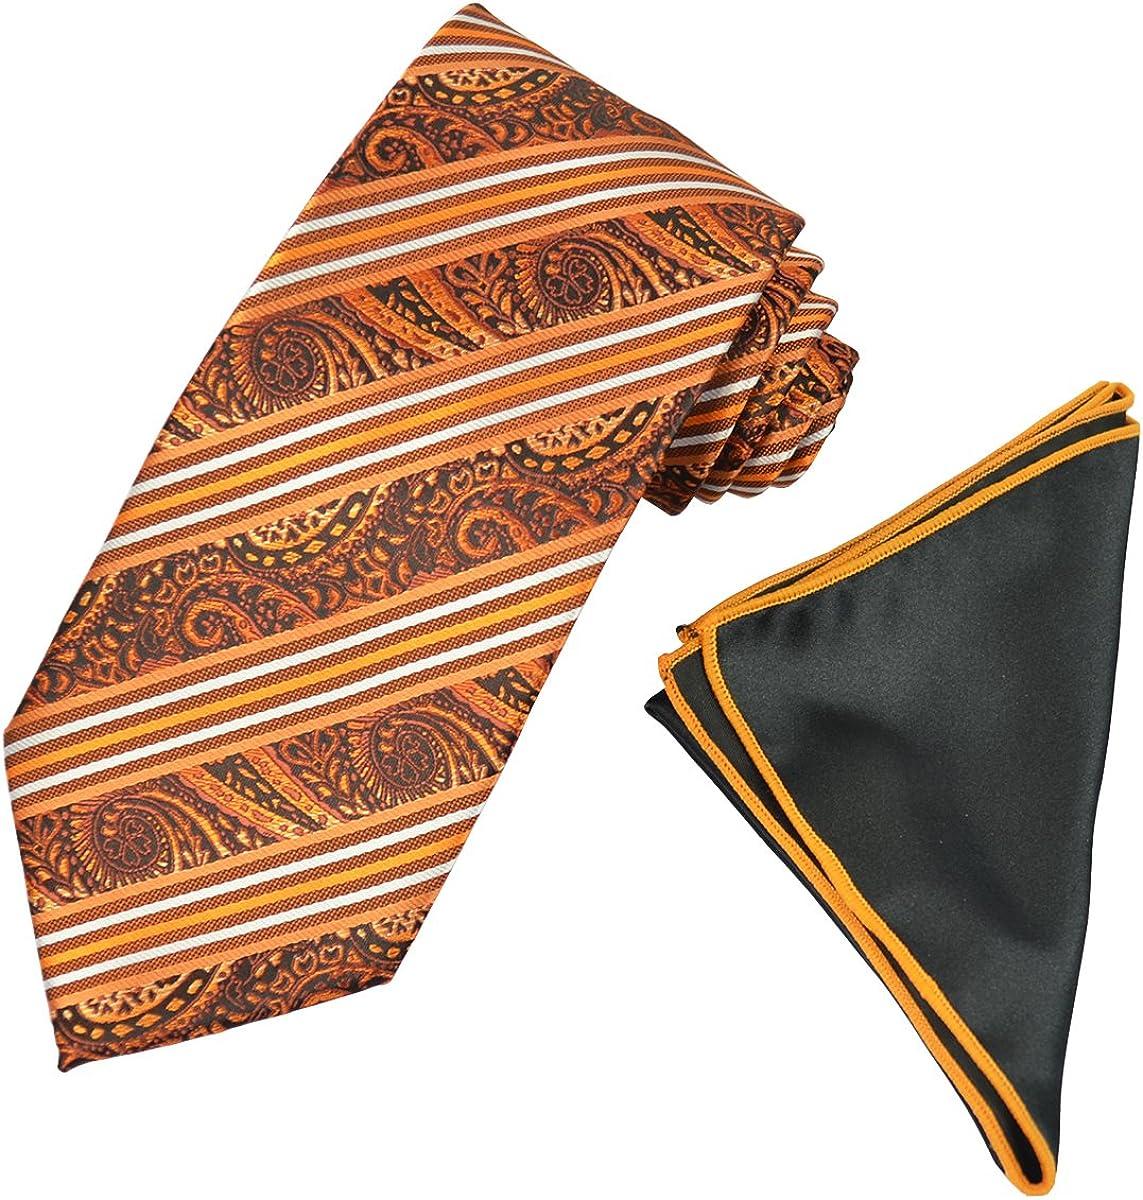 Orange Striped Men's Tie and Pocket Square Set